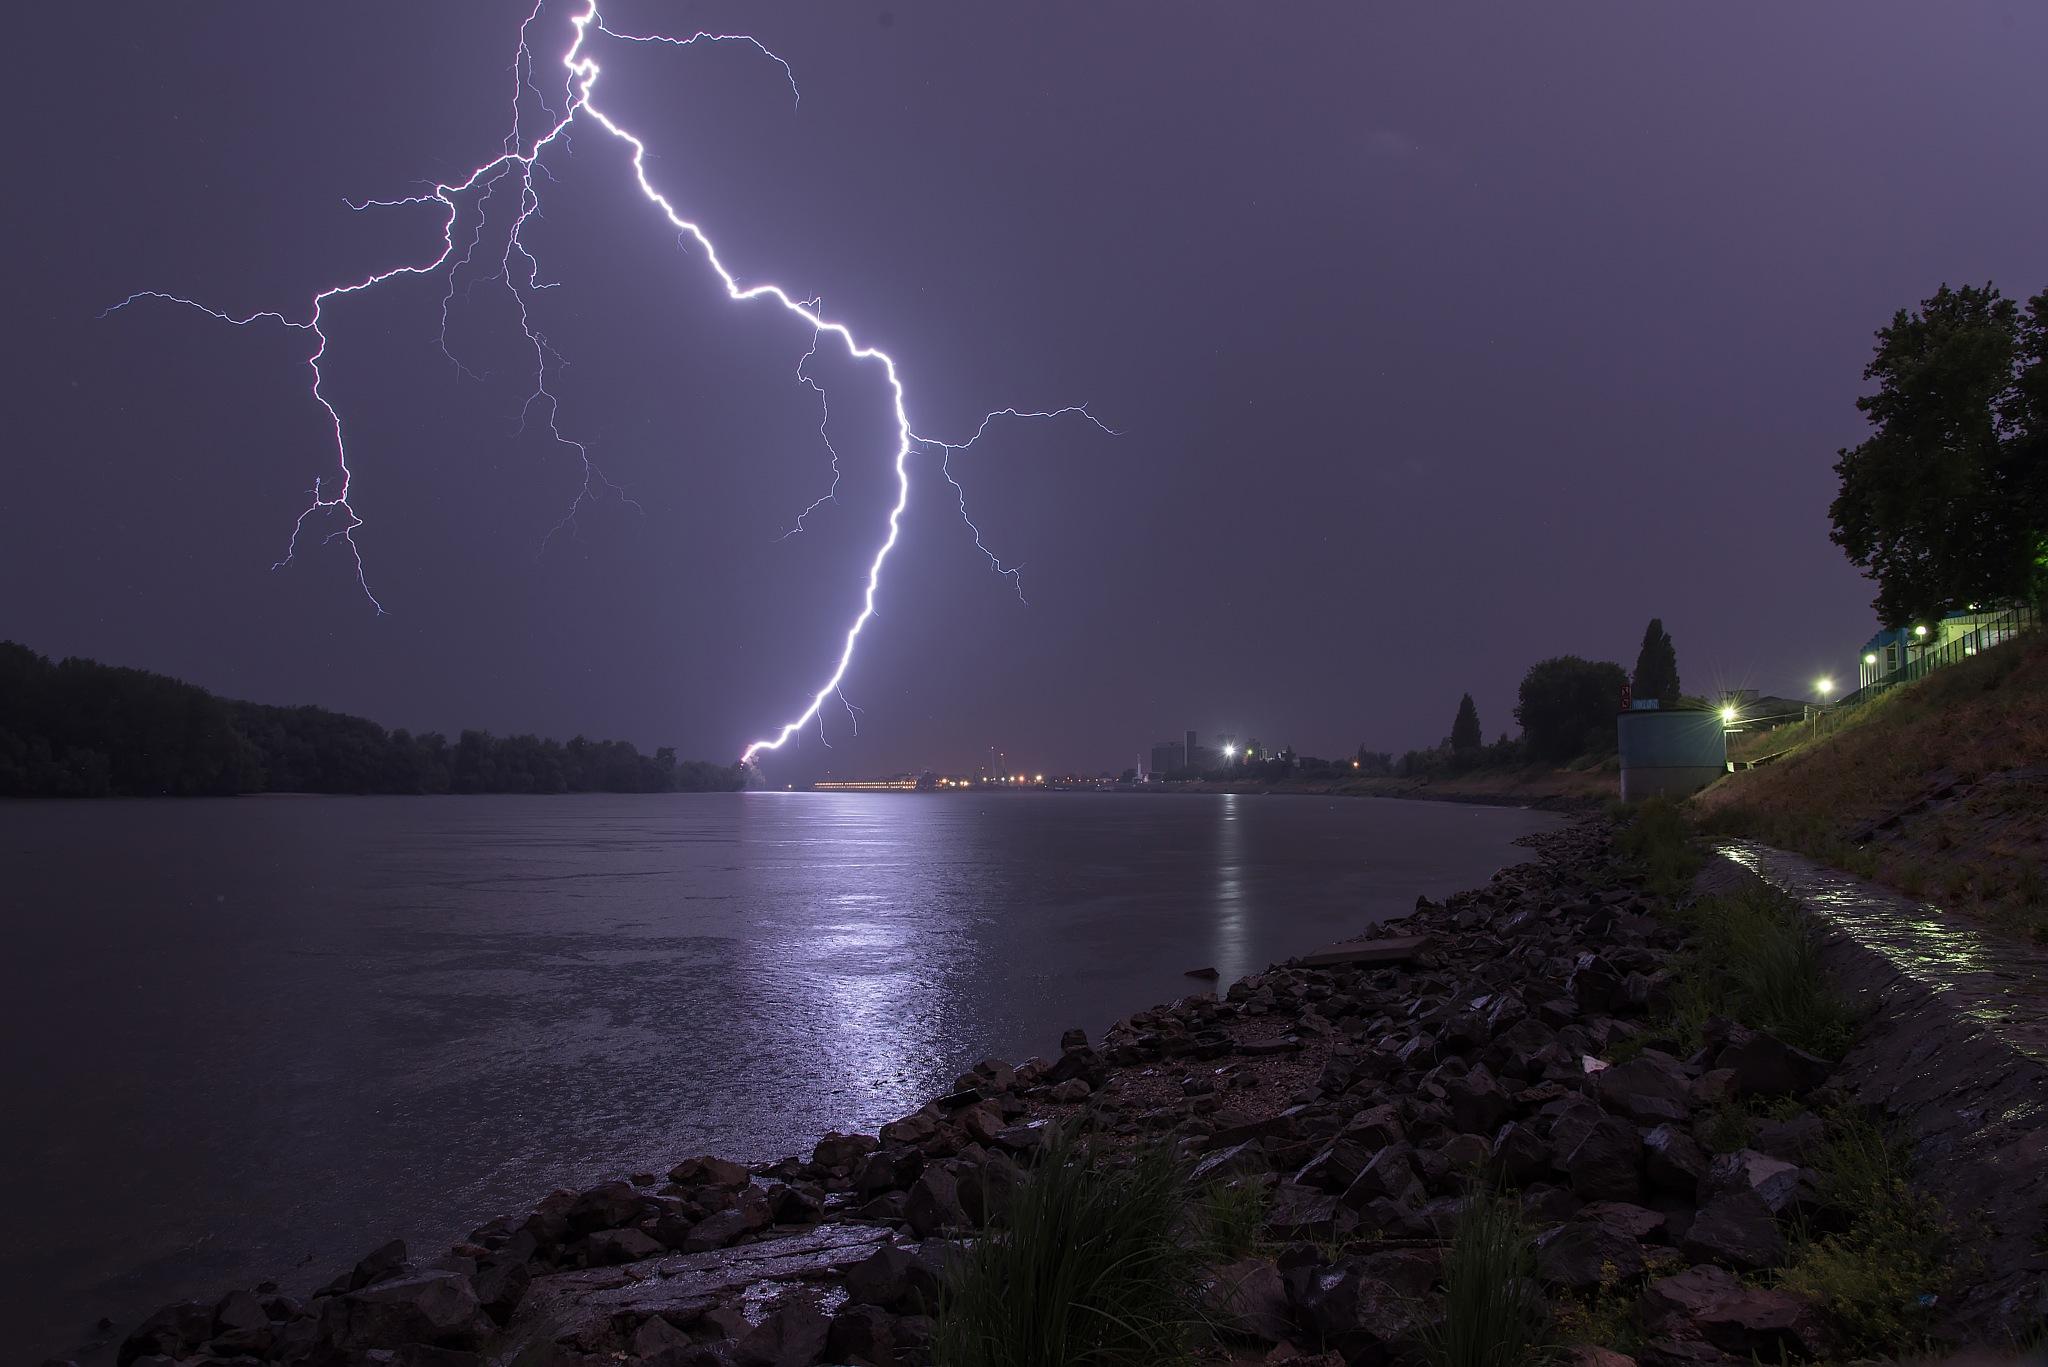 Lightning over Danube 2 by Vanja Vidaković, Vukovar-Croatia